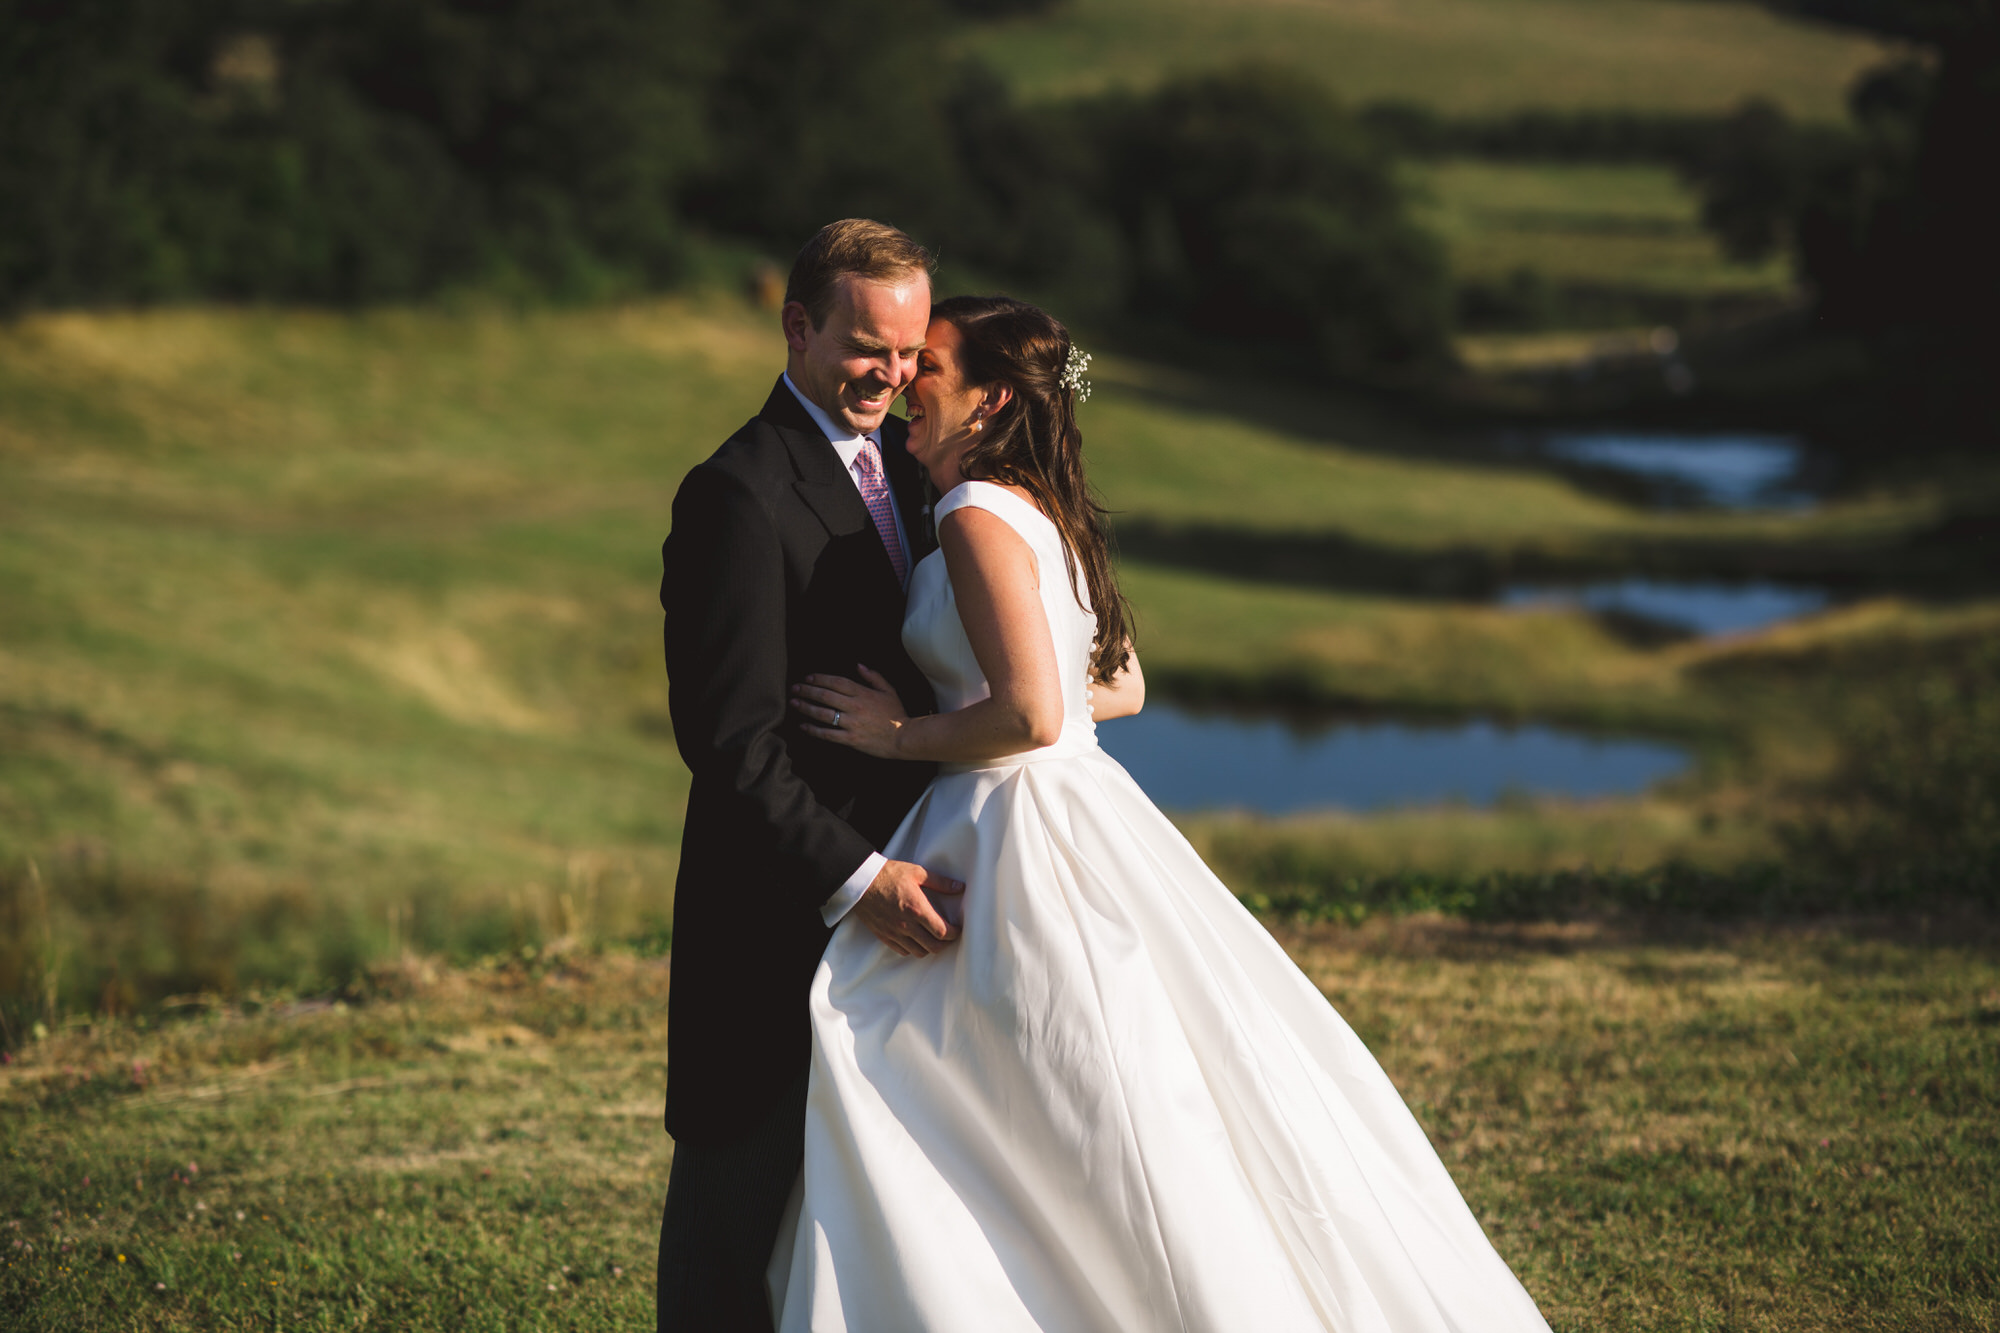 Shilstone wedding photographer 29